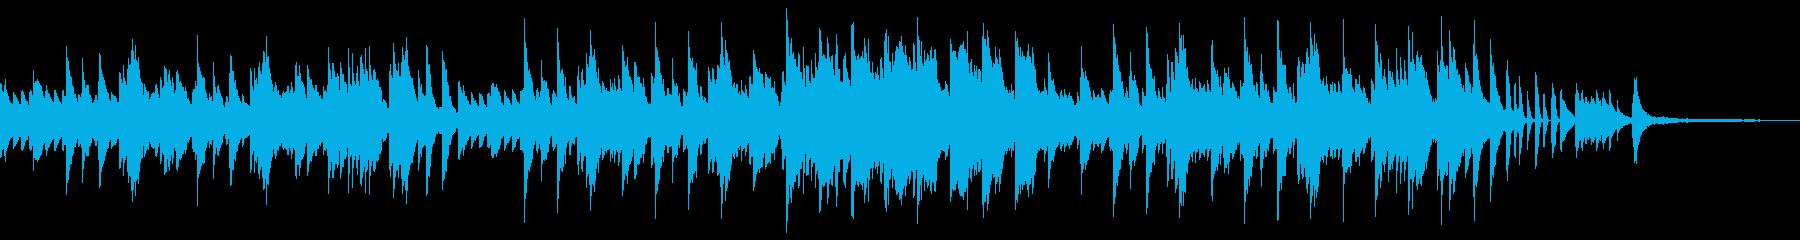 CM 1.朝 さわやか 澄んだ空気の再生済みの波形